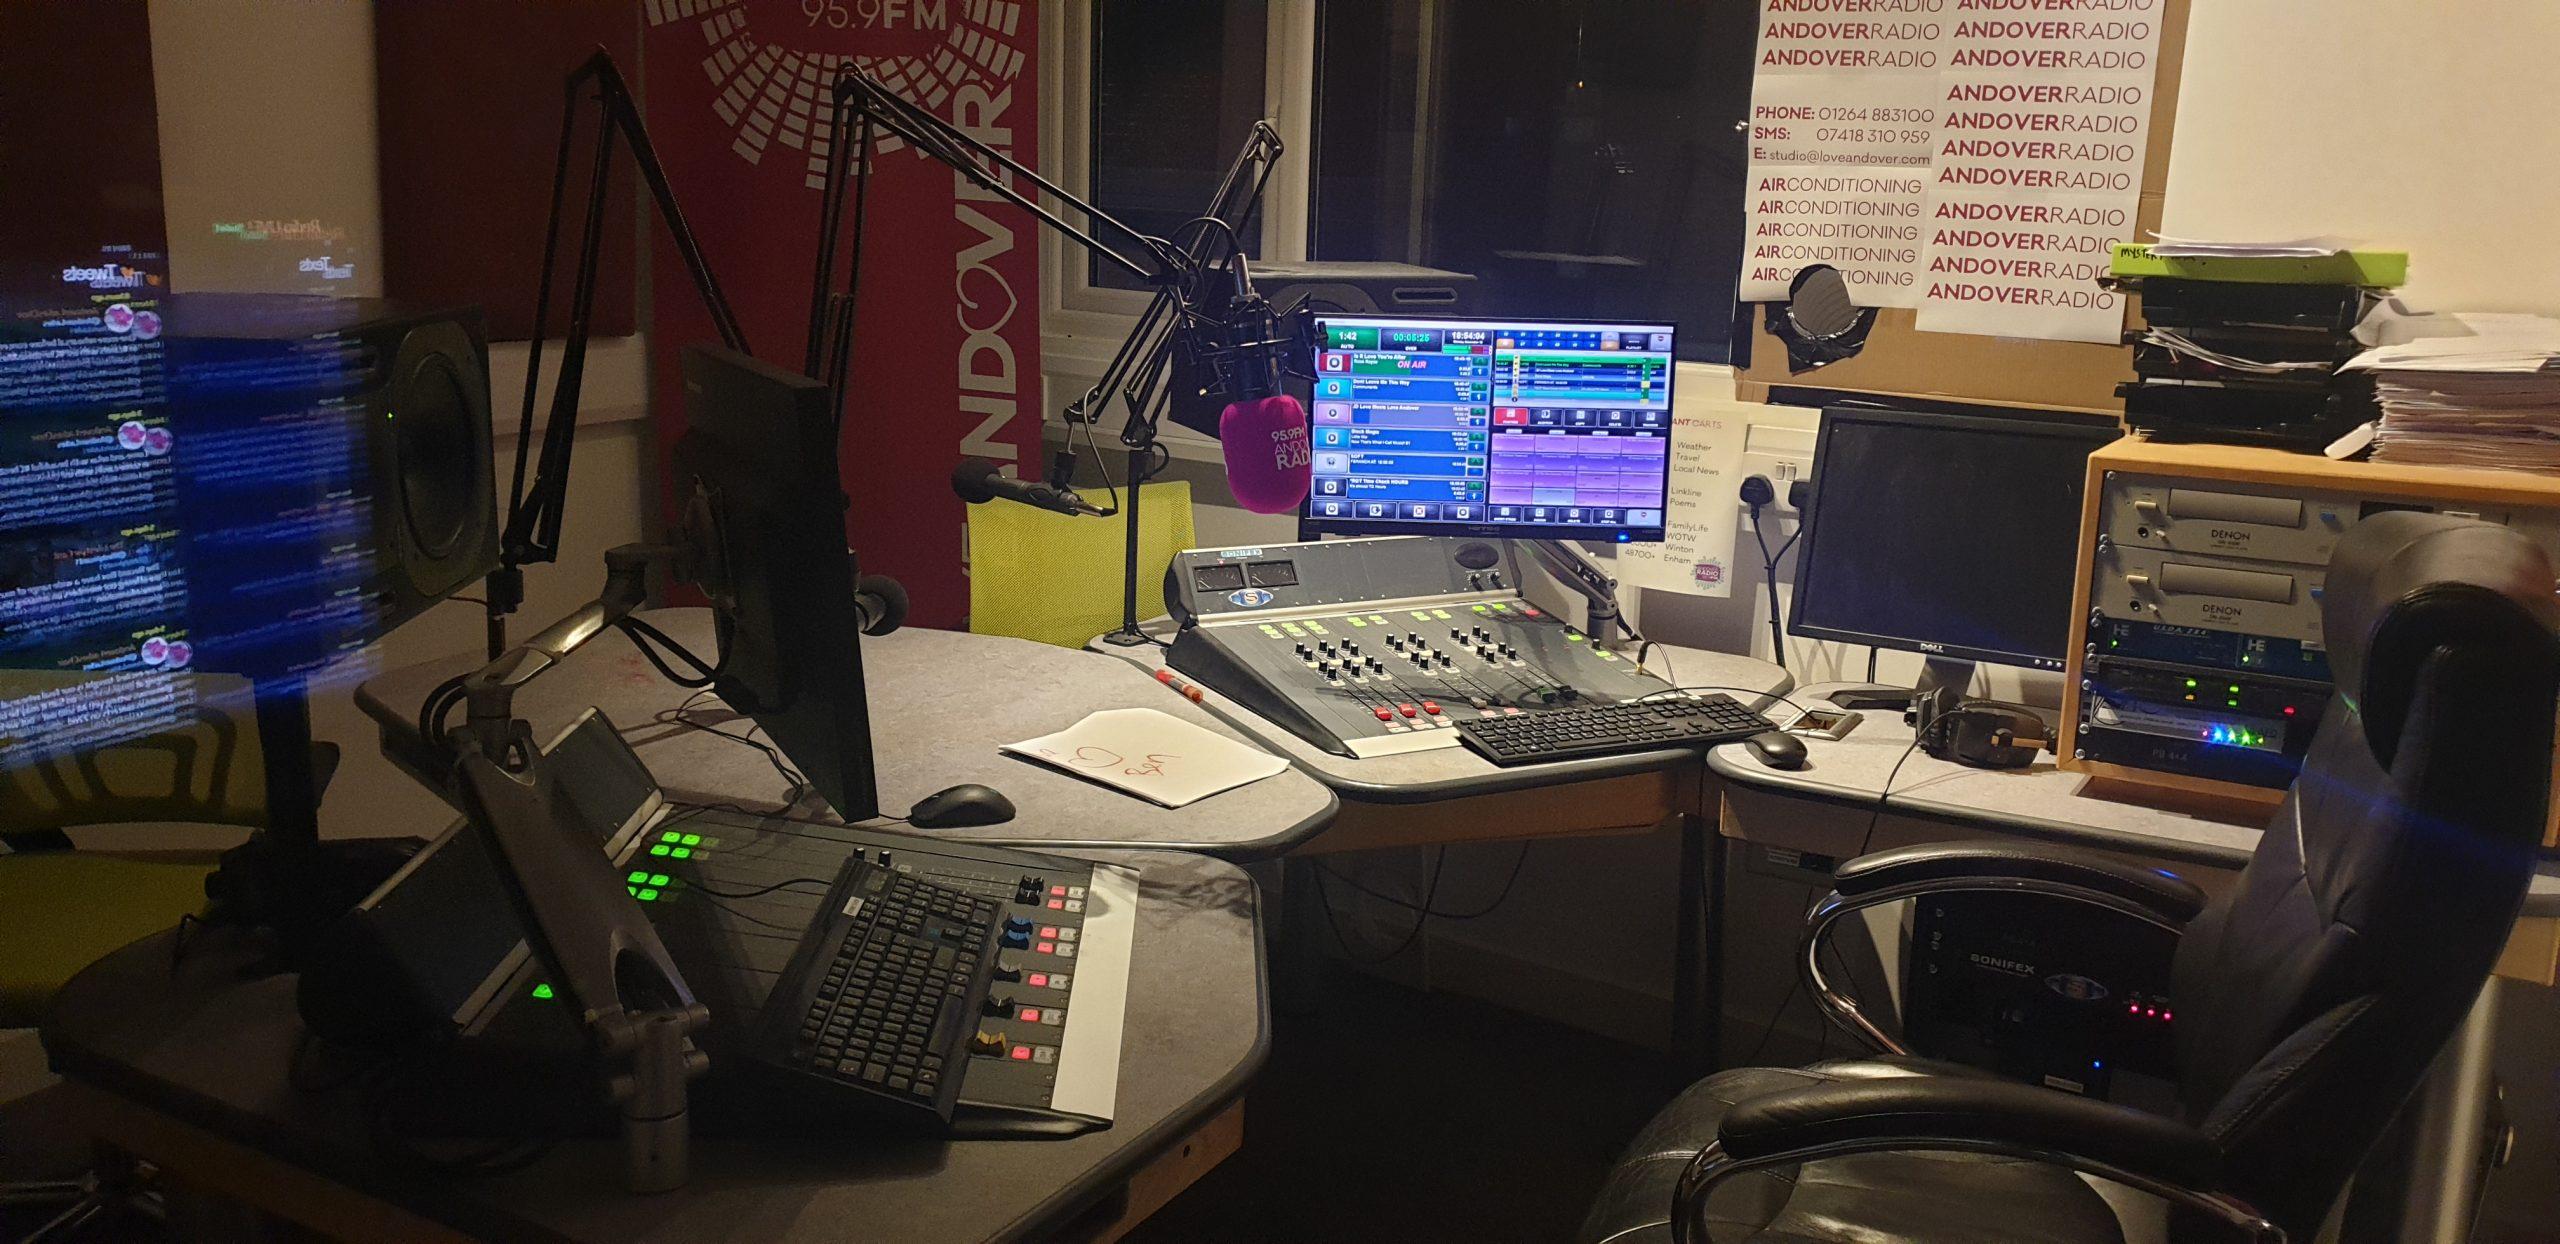 Andover Radio Local News for Andover